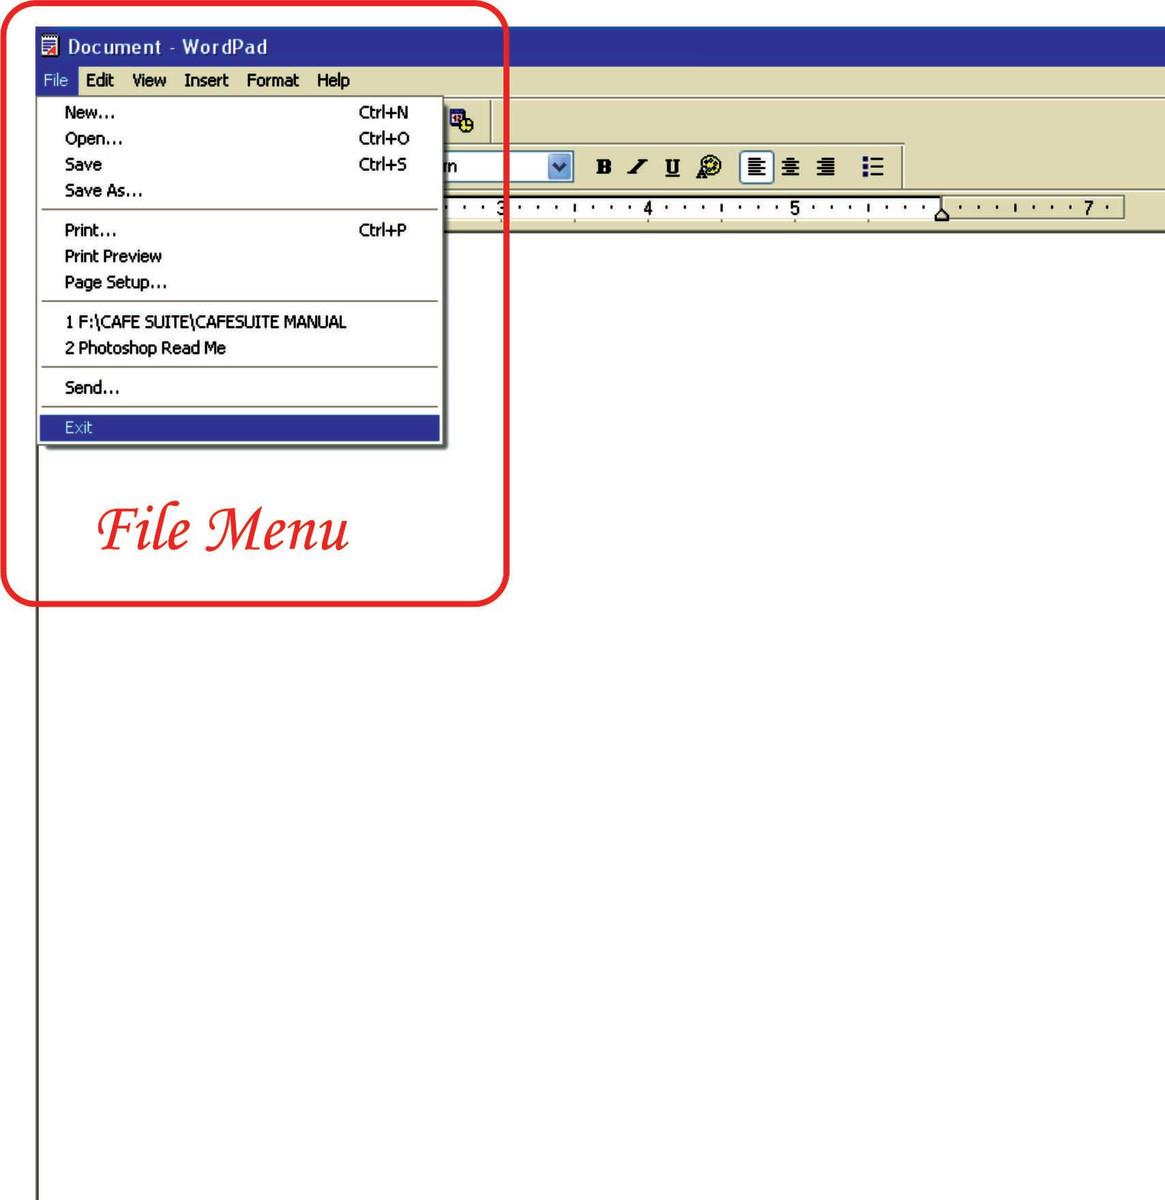 File Menu of WordPad